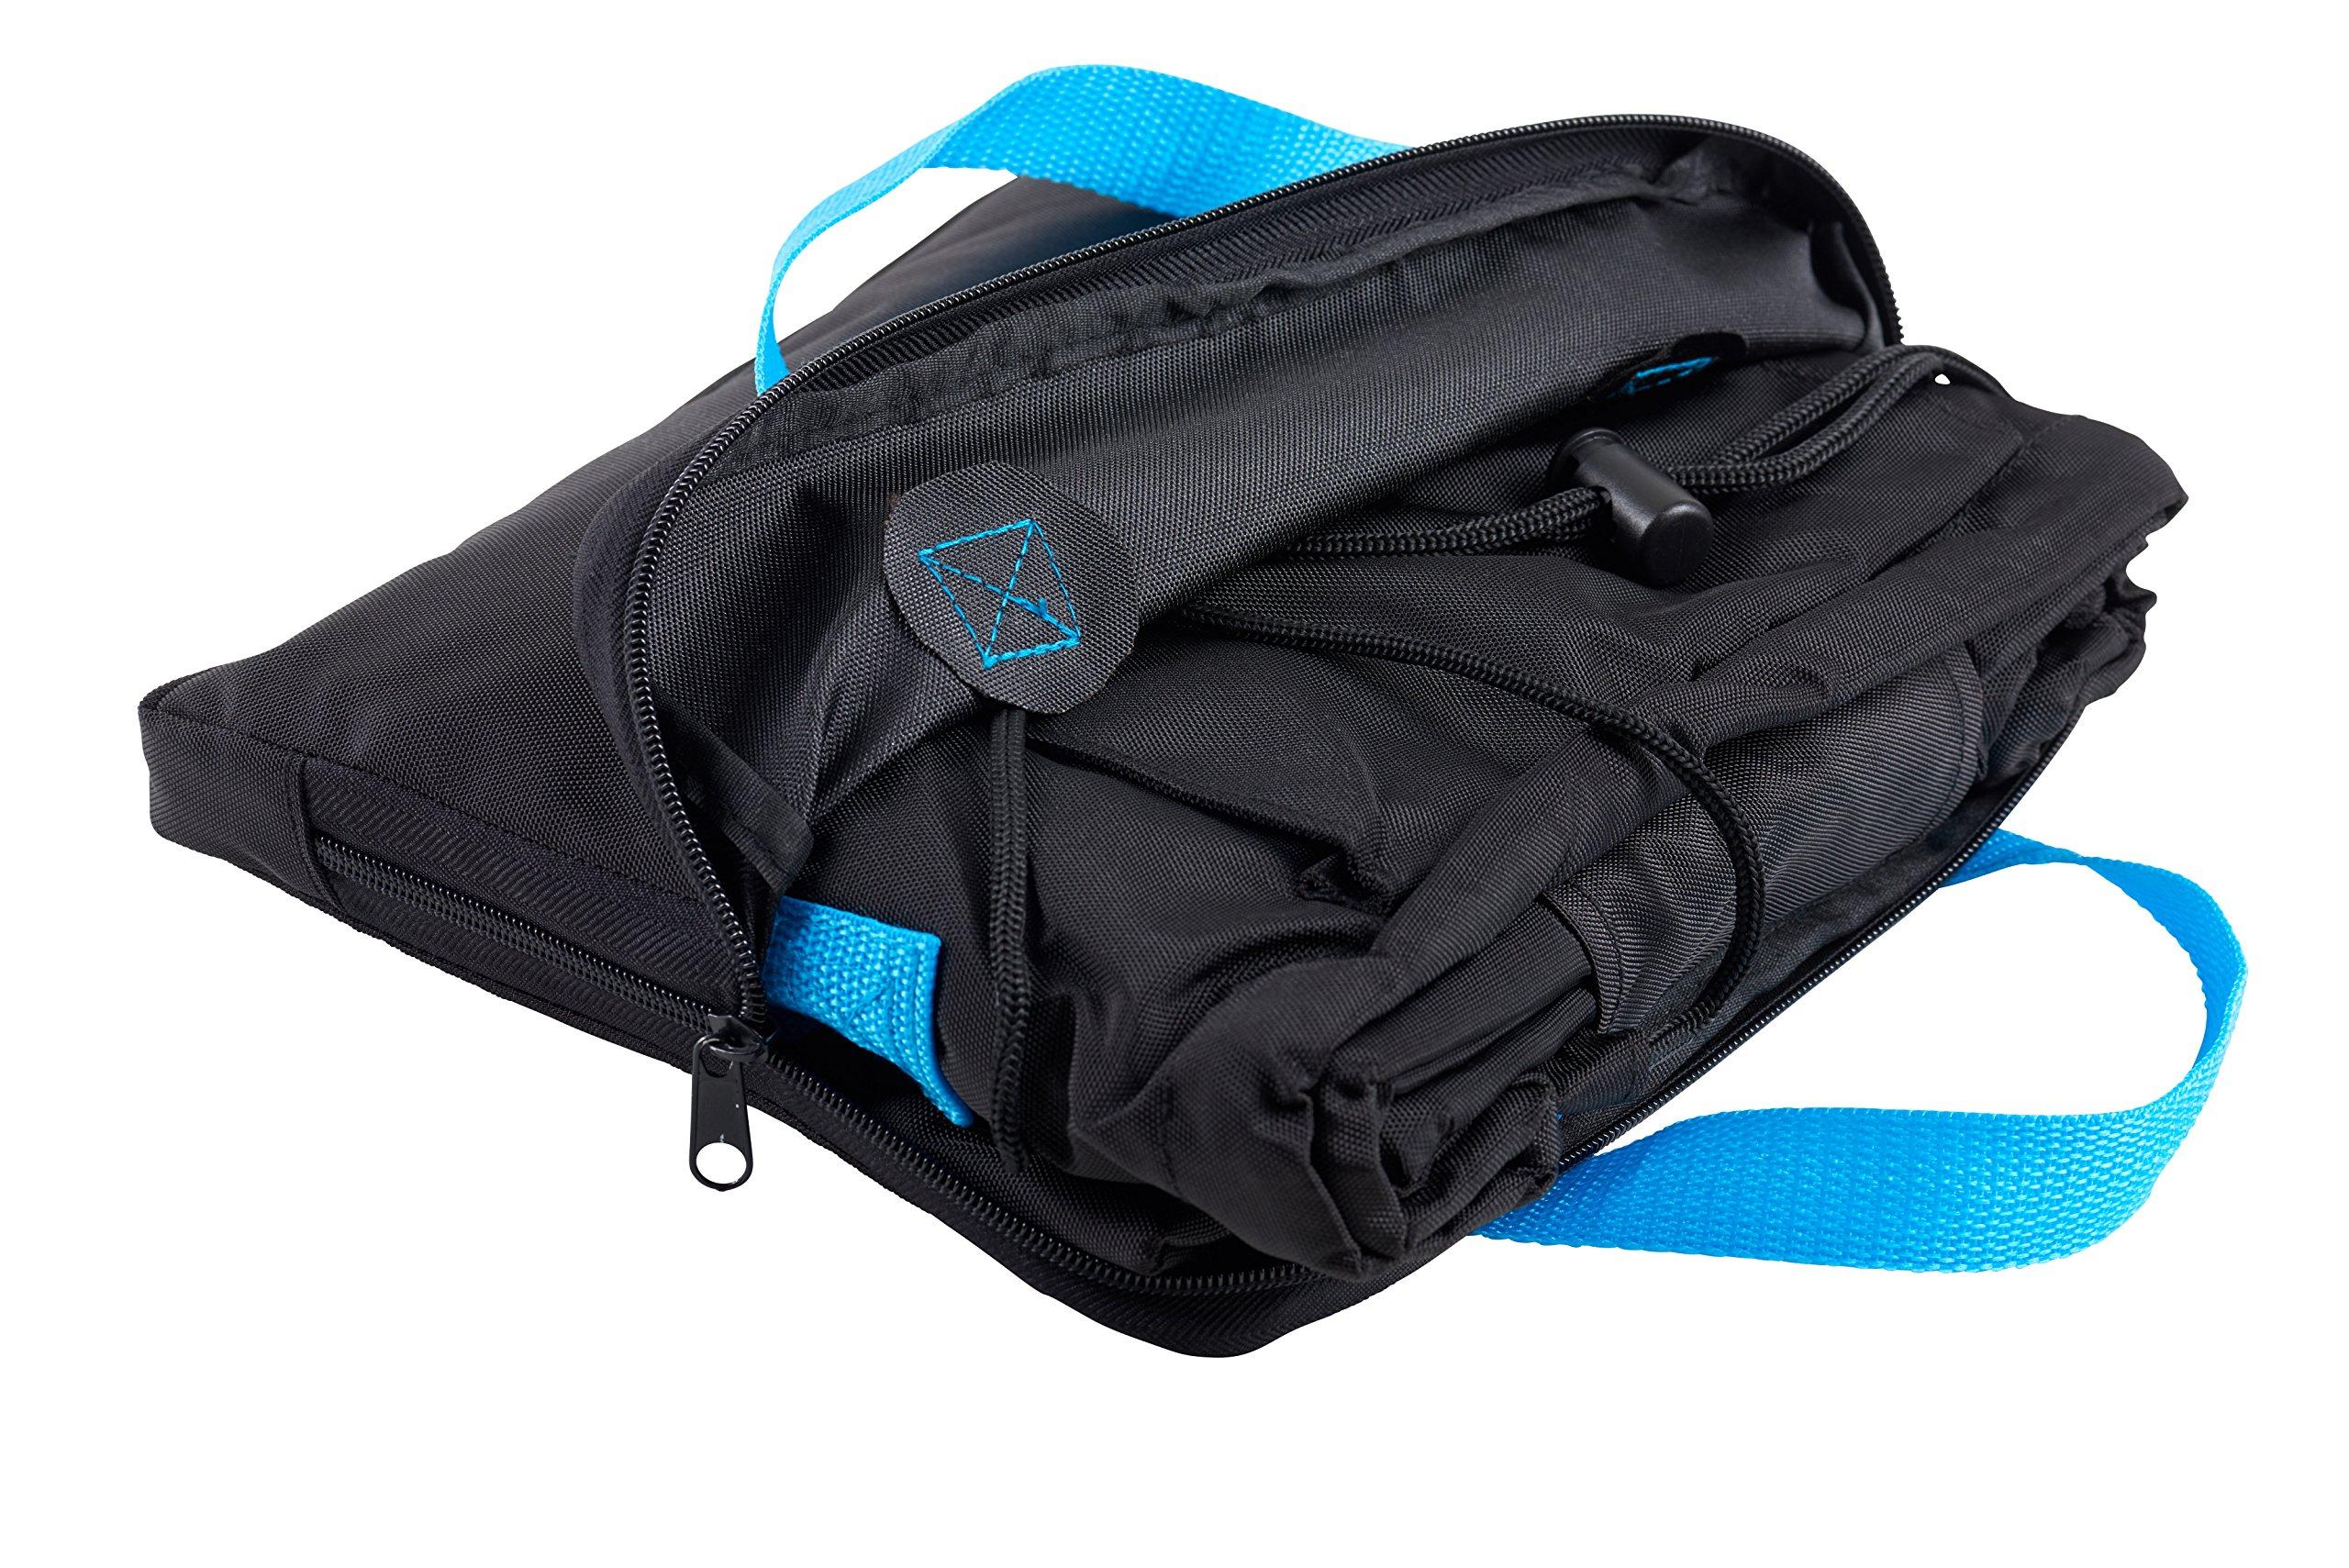 Zohzo Car Seat Travel Bag - Drawstring Bag for Air Travel (Black) by Zohzo